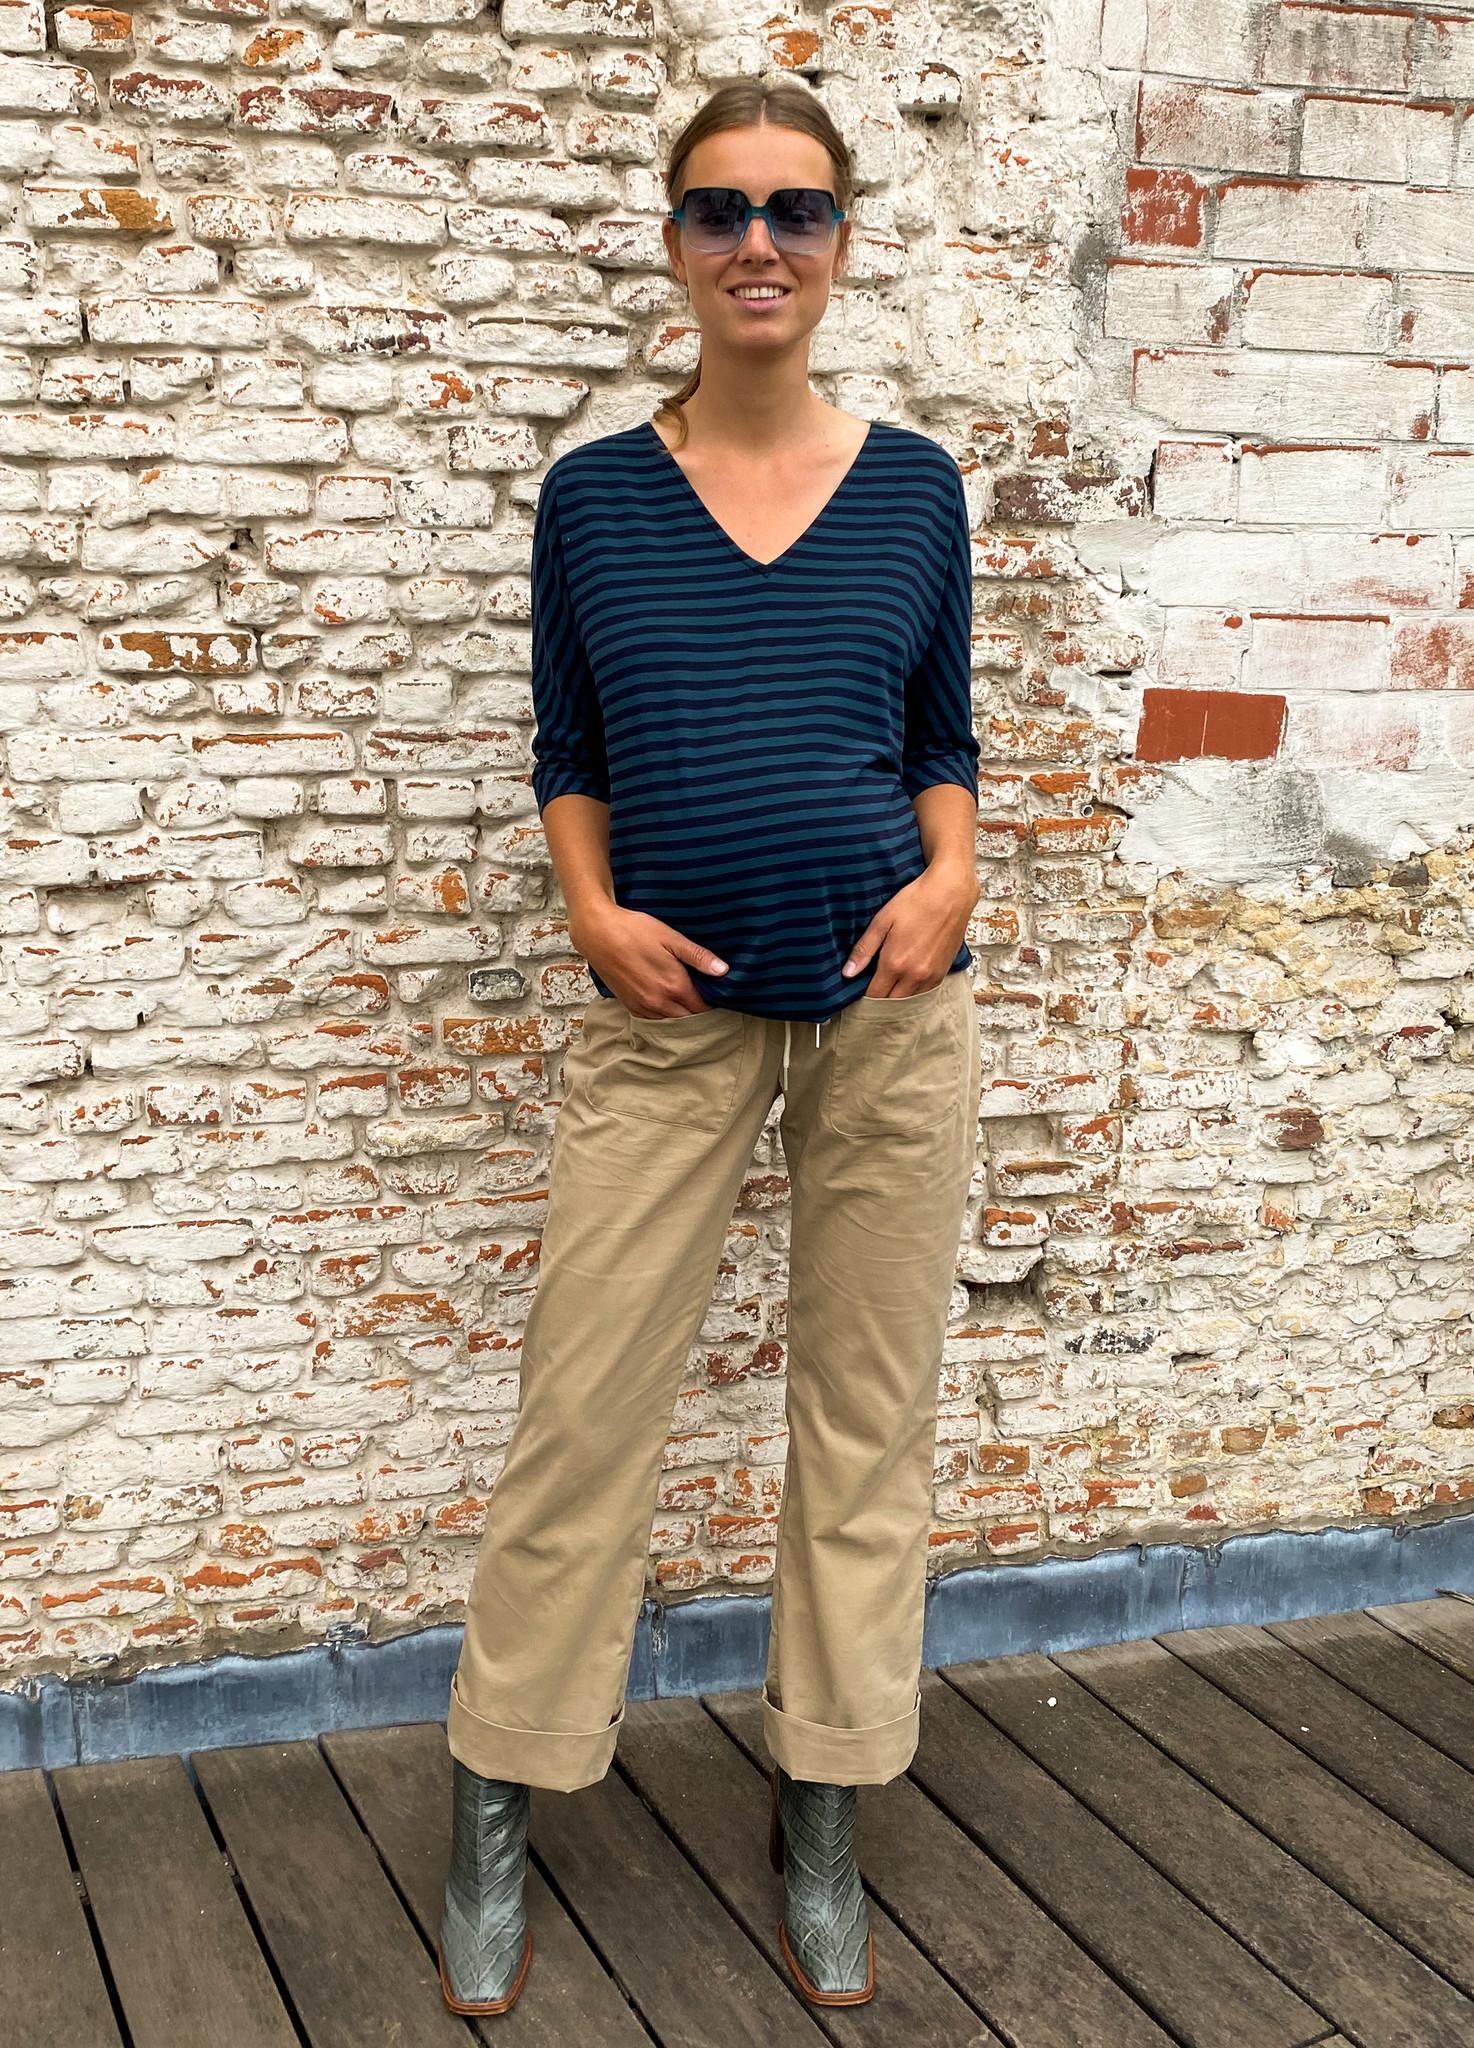 V-neck kimono sweater - petrol/navy stripes-1